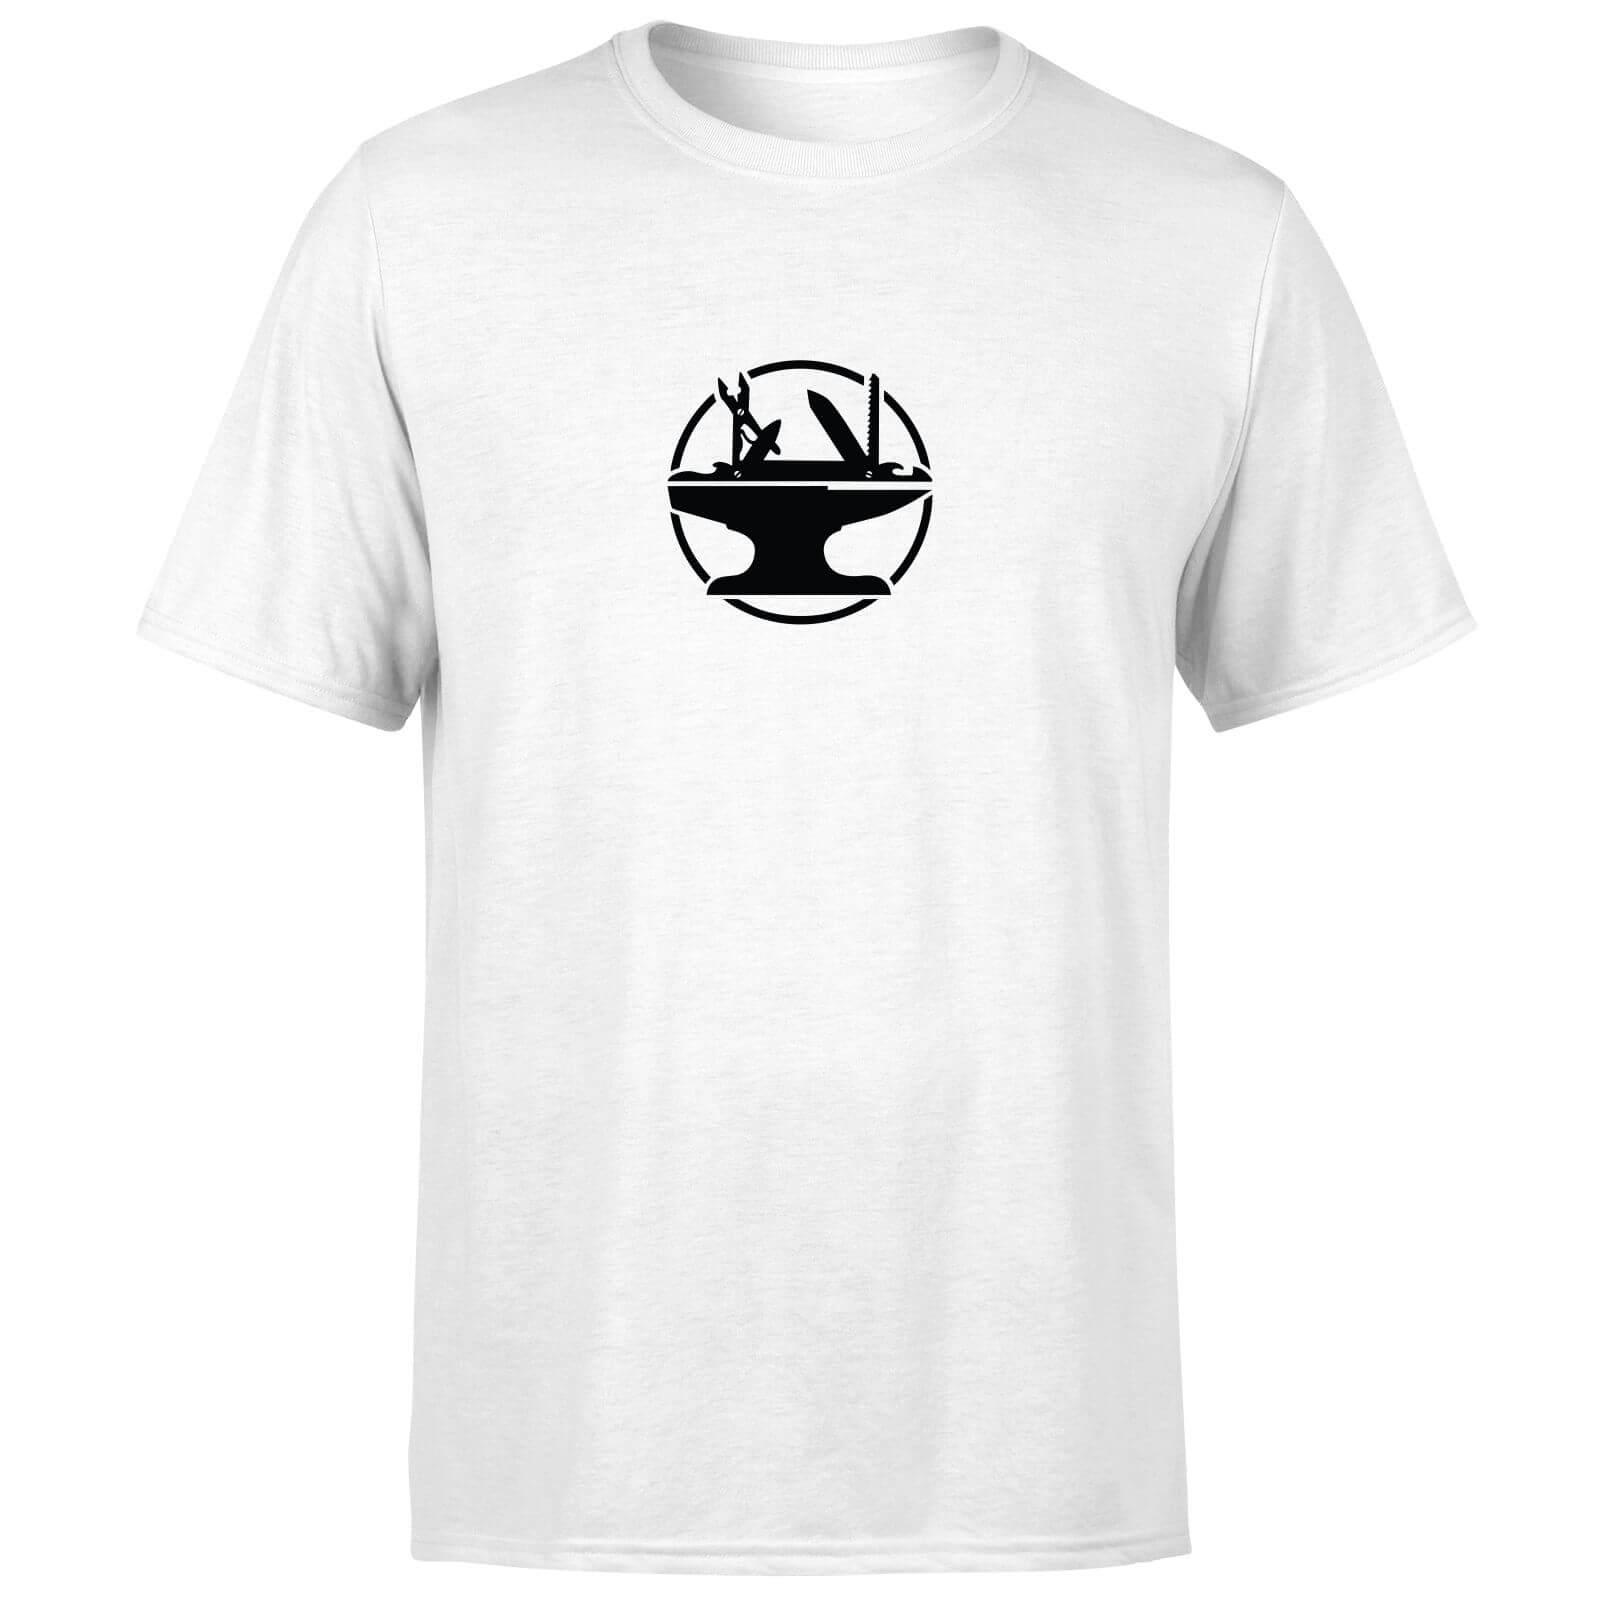 Hacksmith Logo T-Shirt - White - 5XL - White